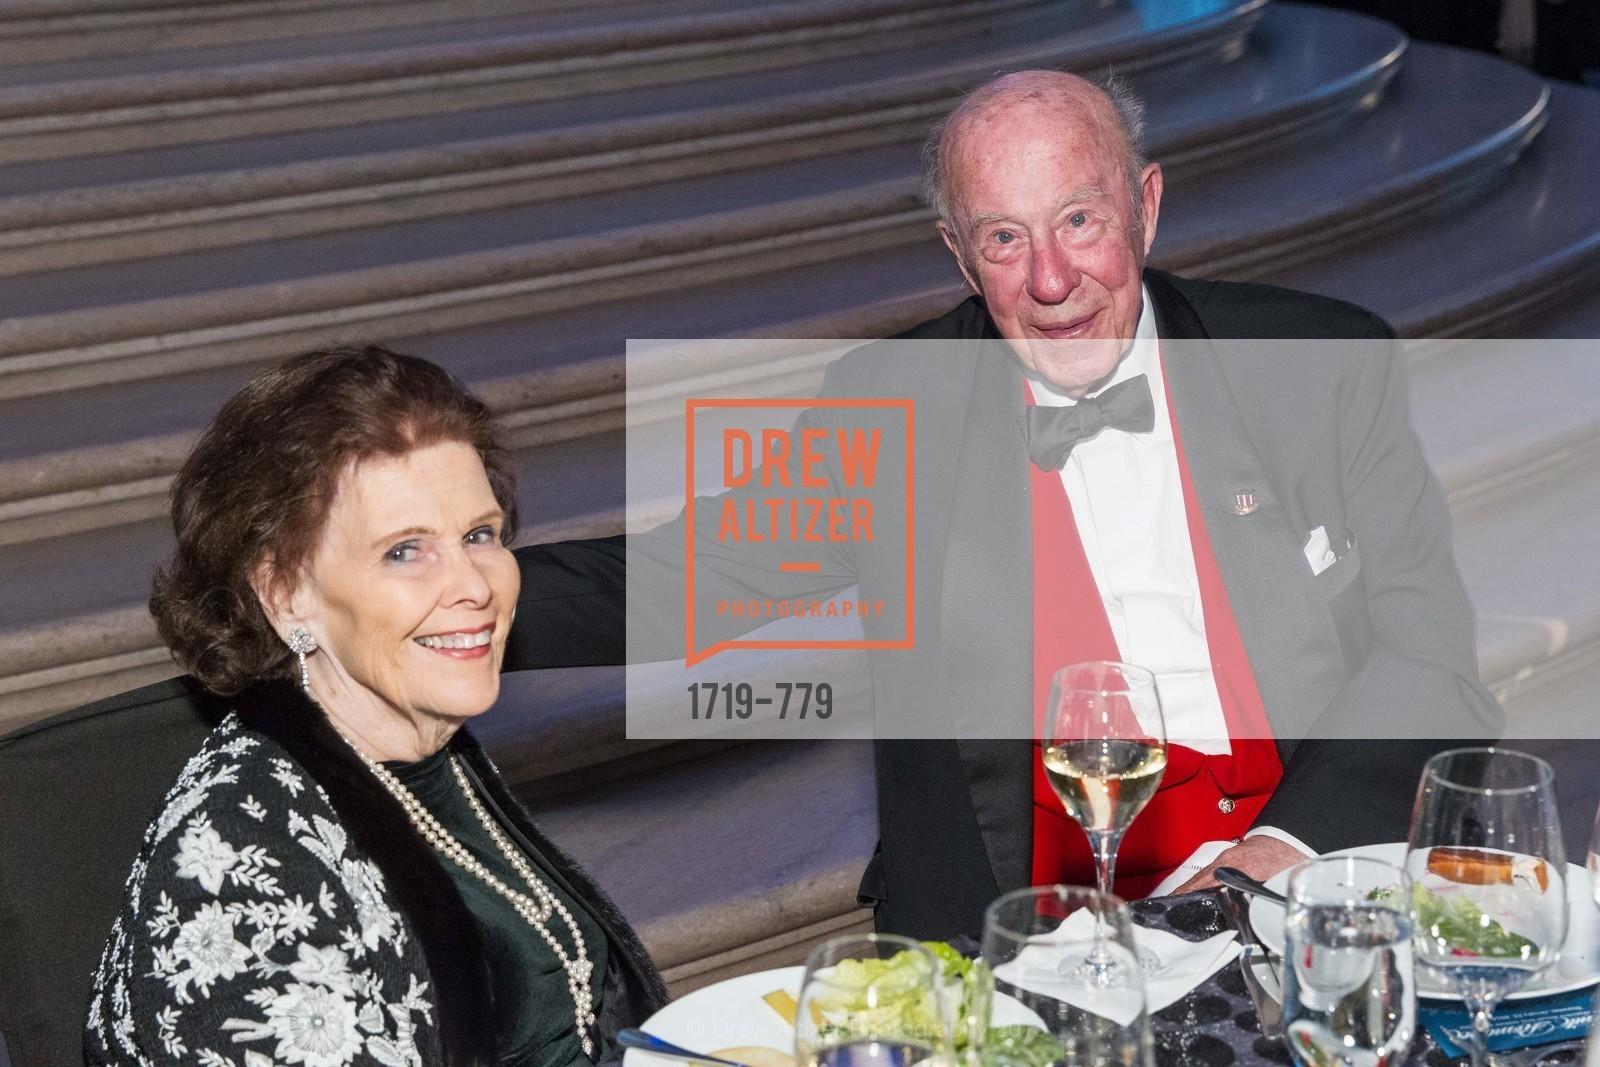 Lucy Jewett, George Shultz, Photo #1719-779